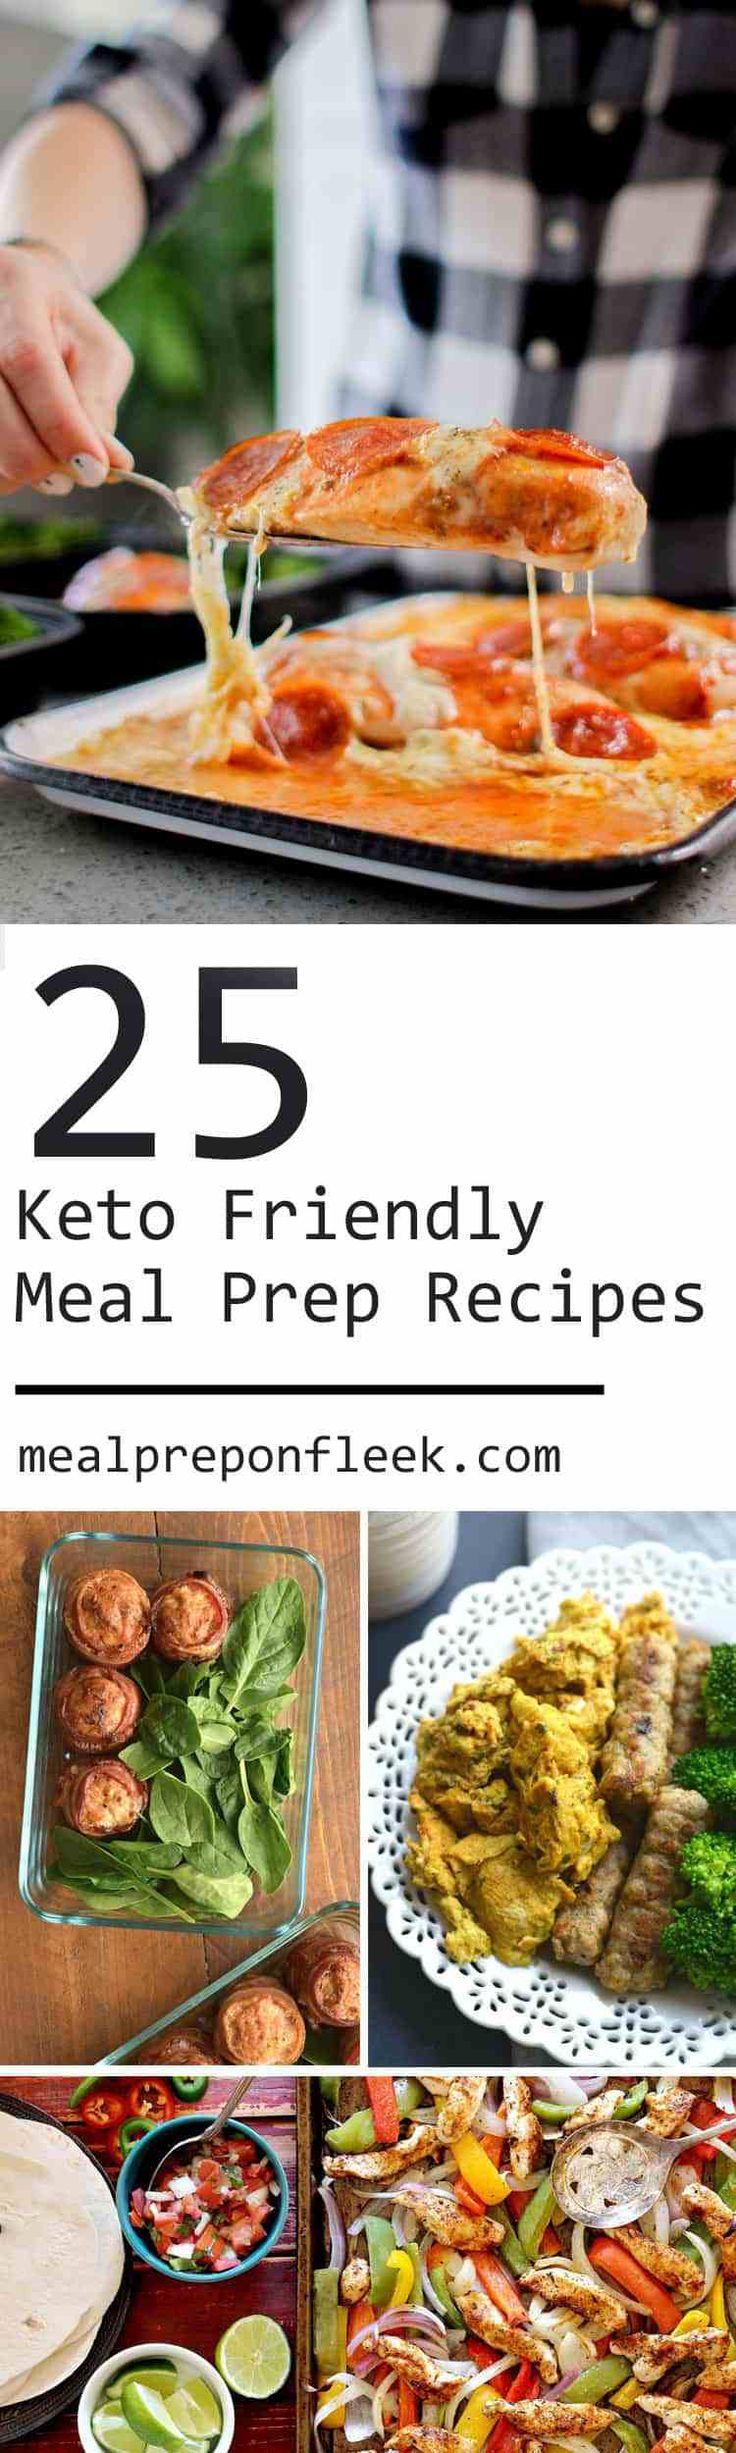 High Fat Low Carb Recipes - Keto Meal Prep Recipes